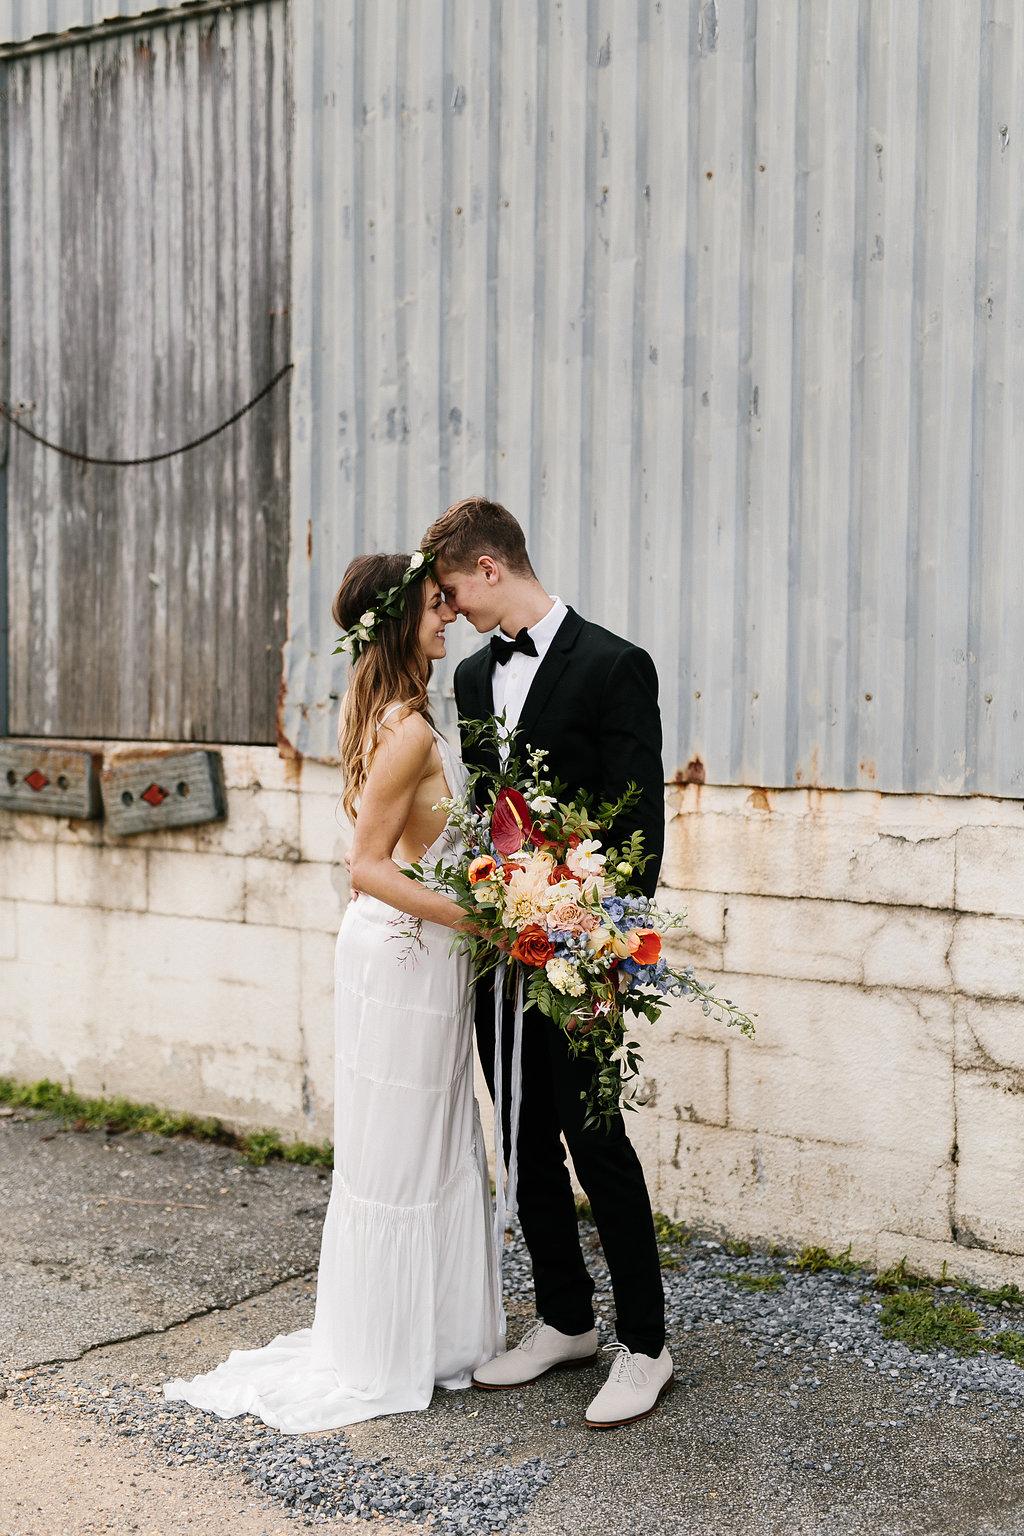 justin&emily-wedding-498.jpg